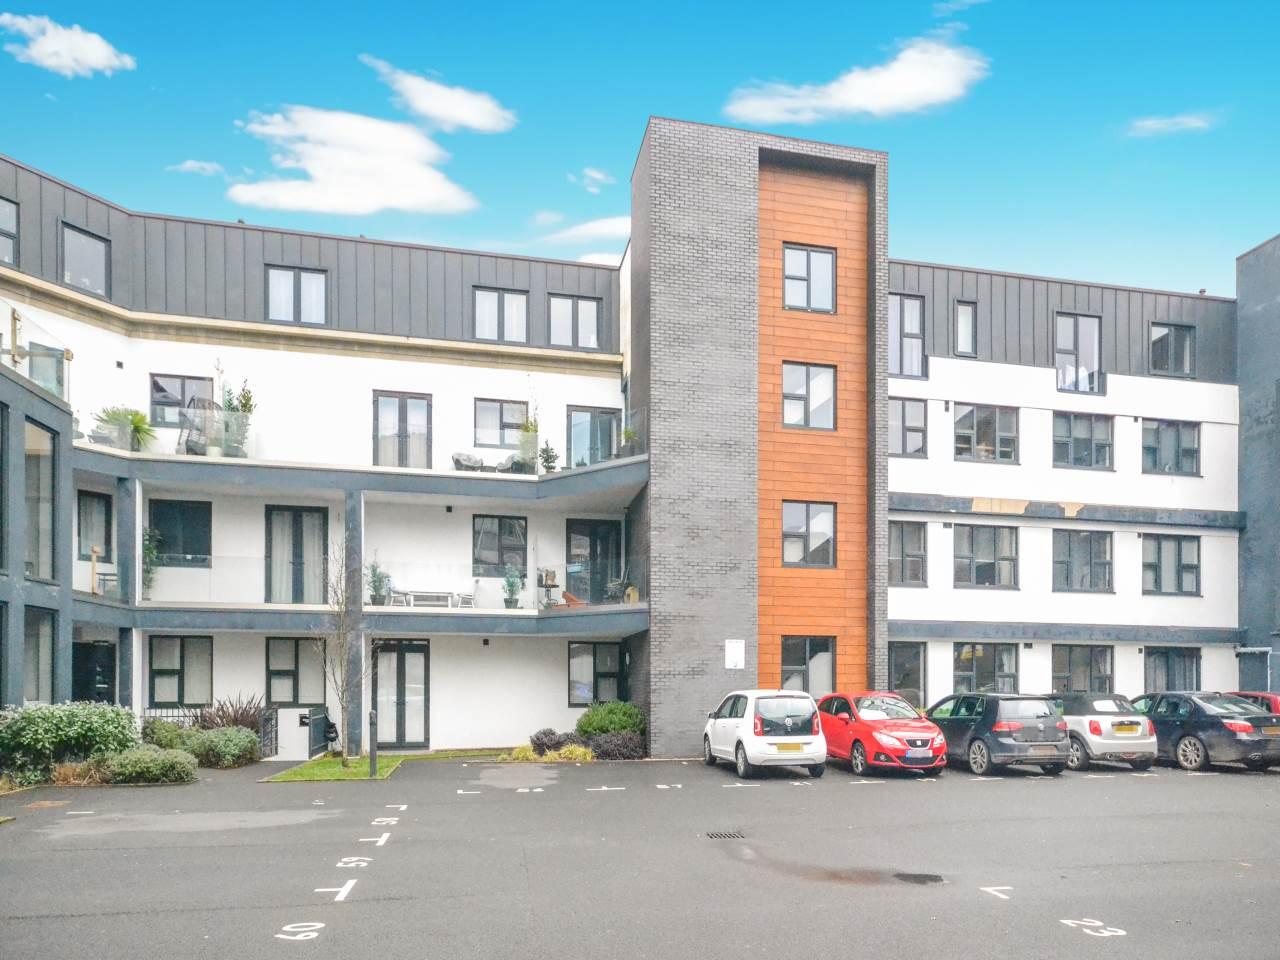 2 bed flat for sale in 3 Sandbanks Road, Poole - Property Image 1